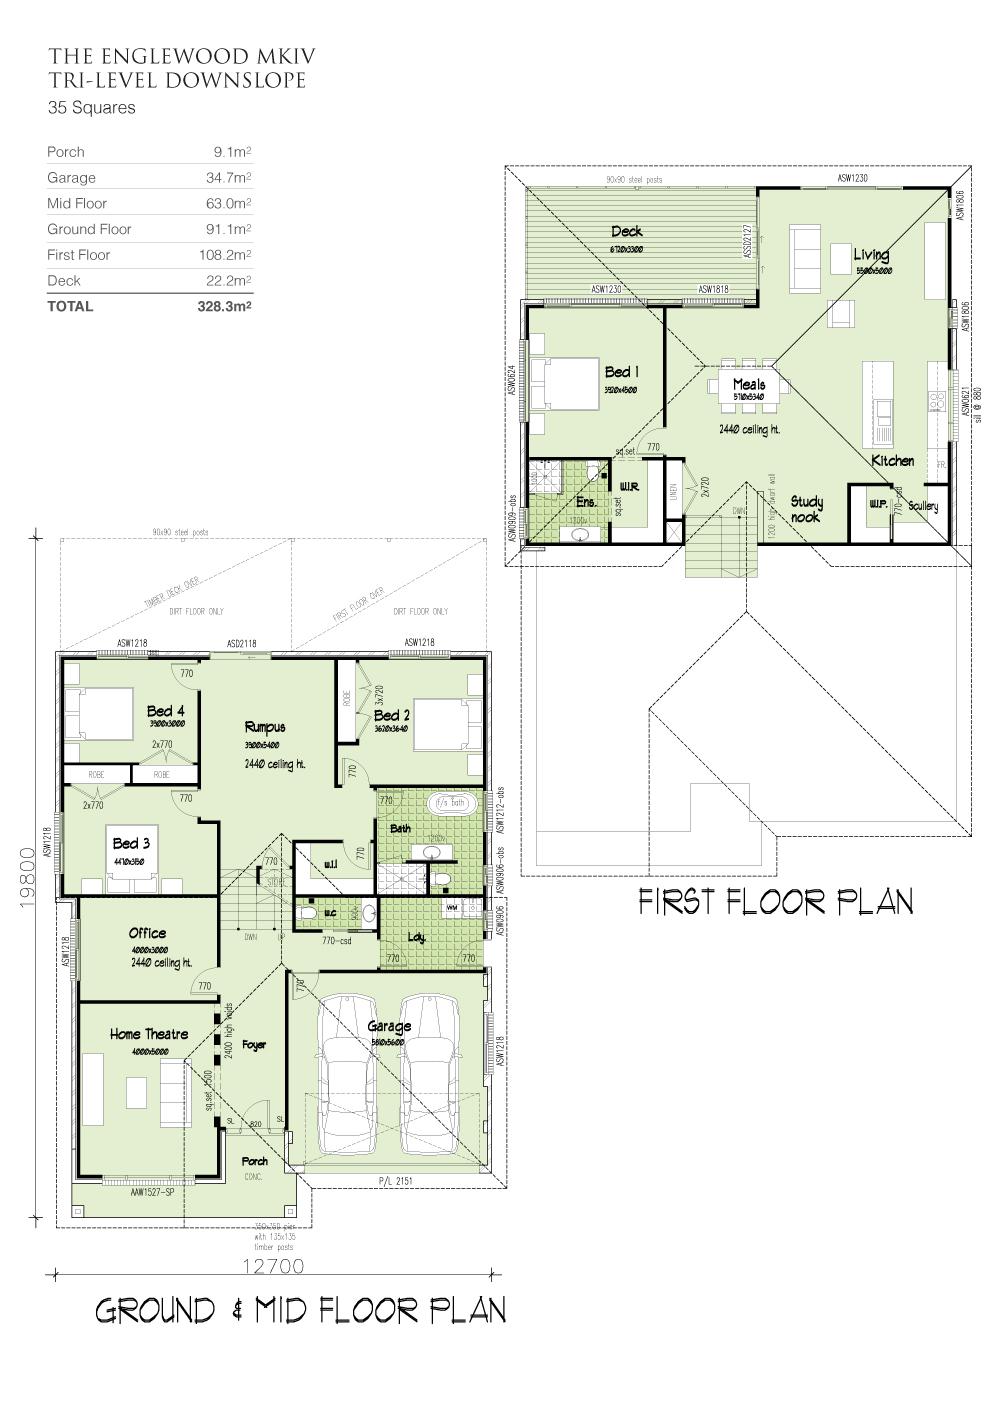 Englewood MKIV Tri-Level Downslope, Home Design, Tullipan Homes